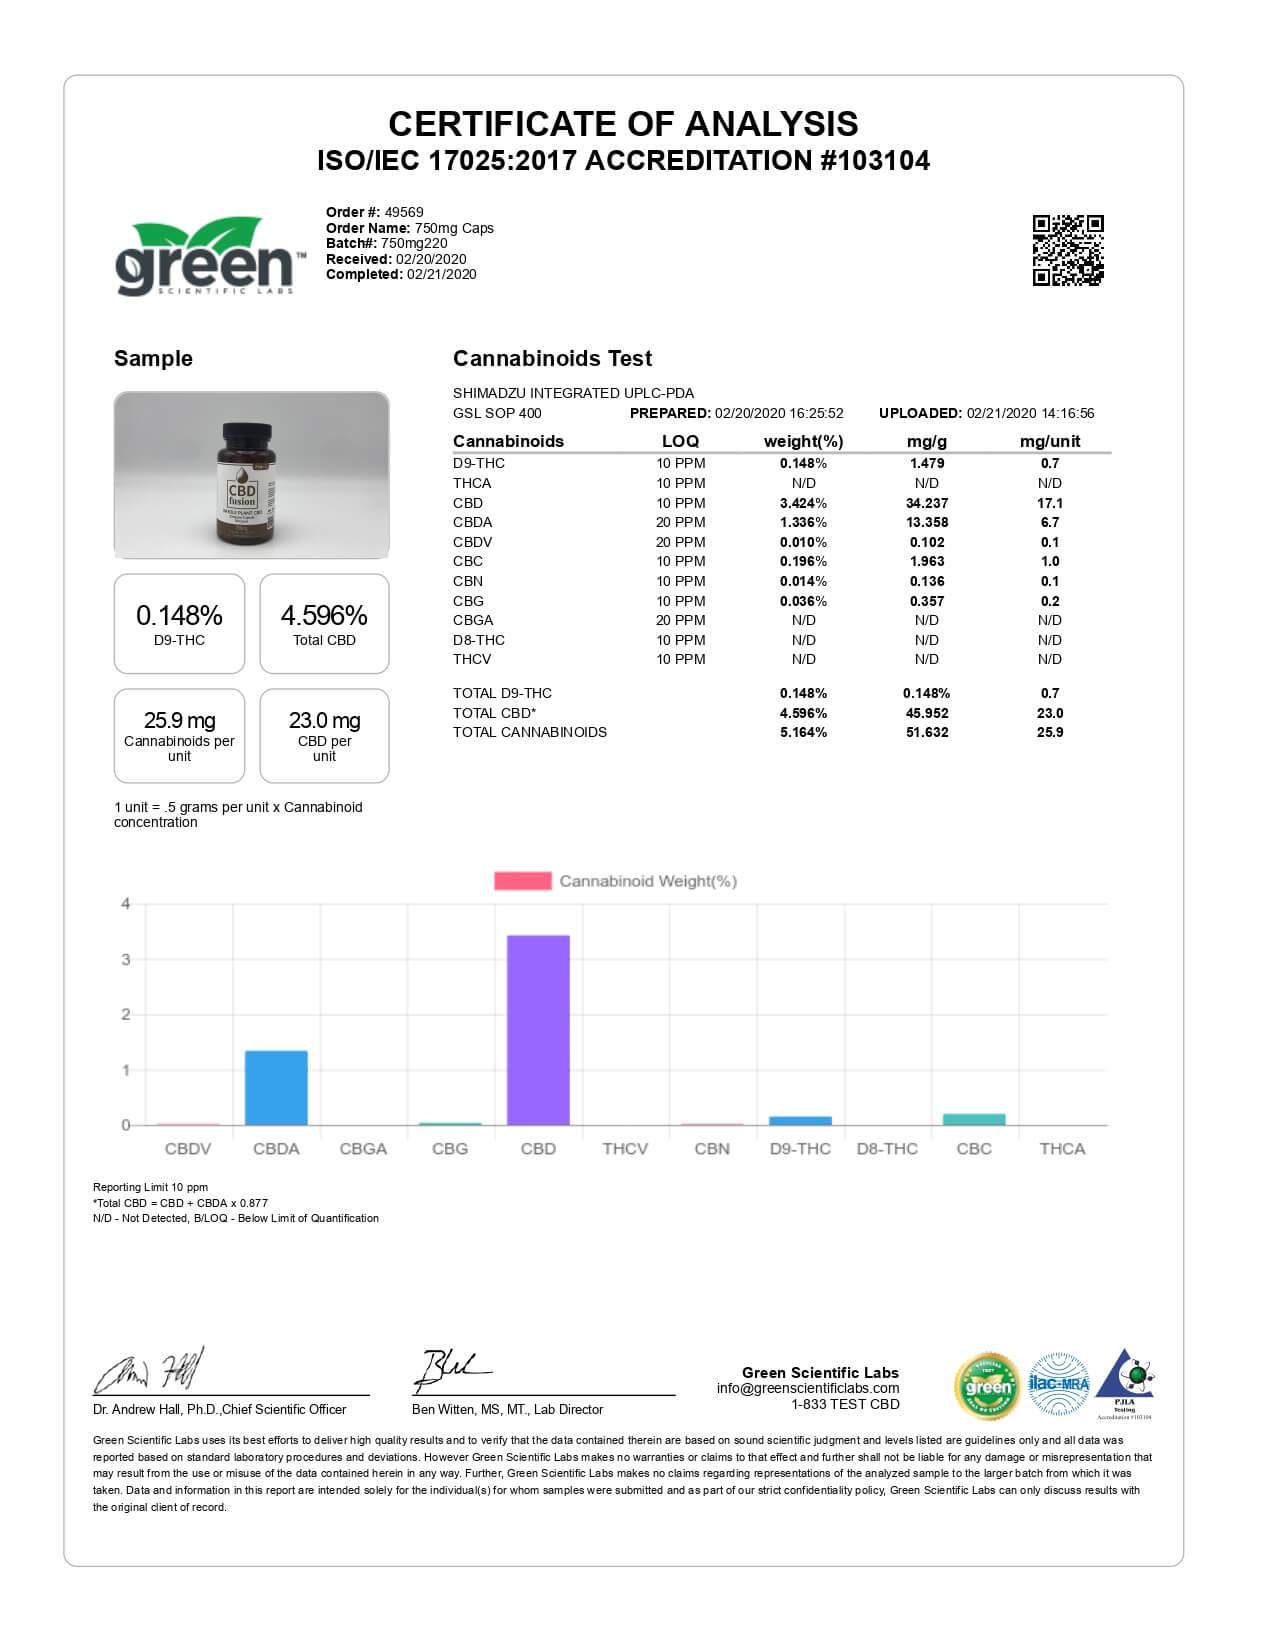 CBD Fusion Whole Plant Caps Lab Report 750mg